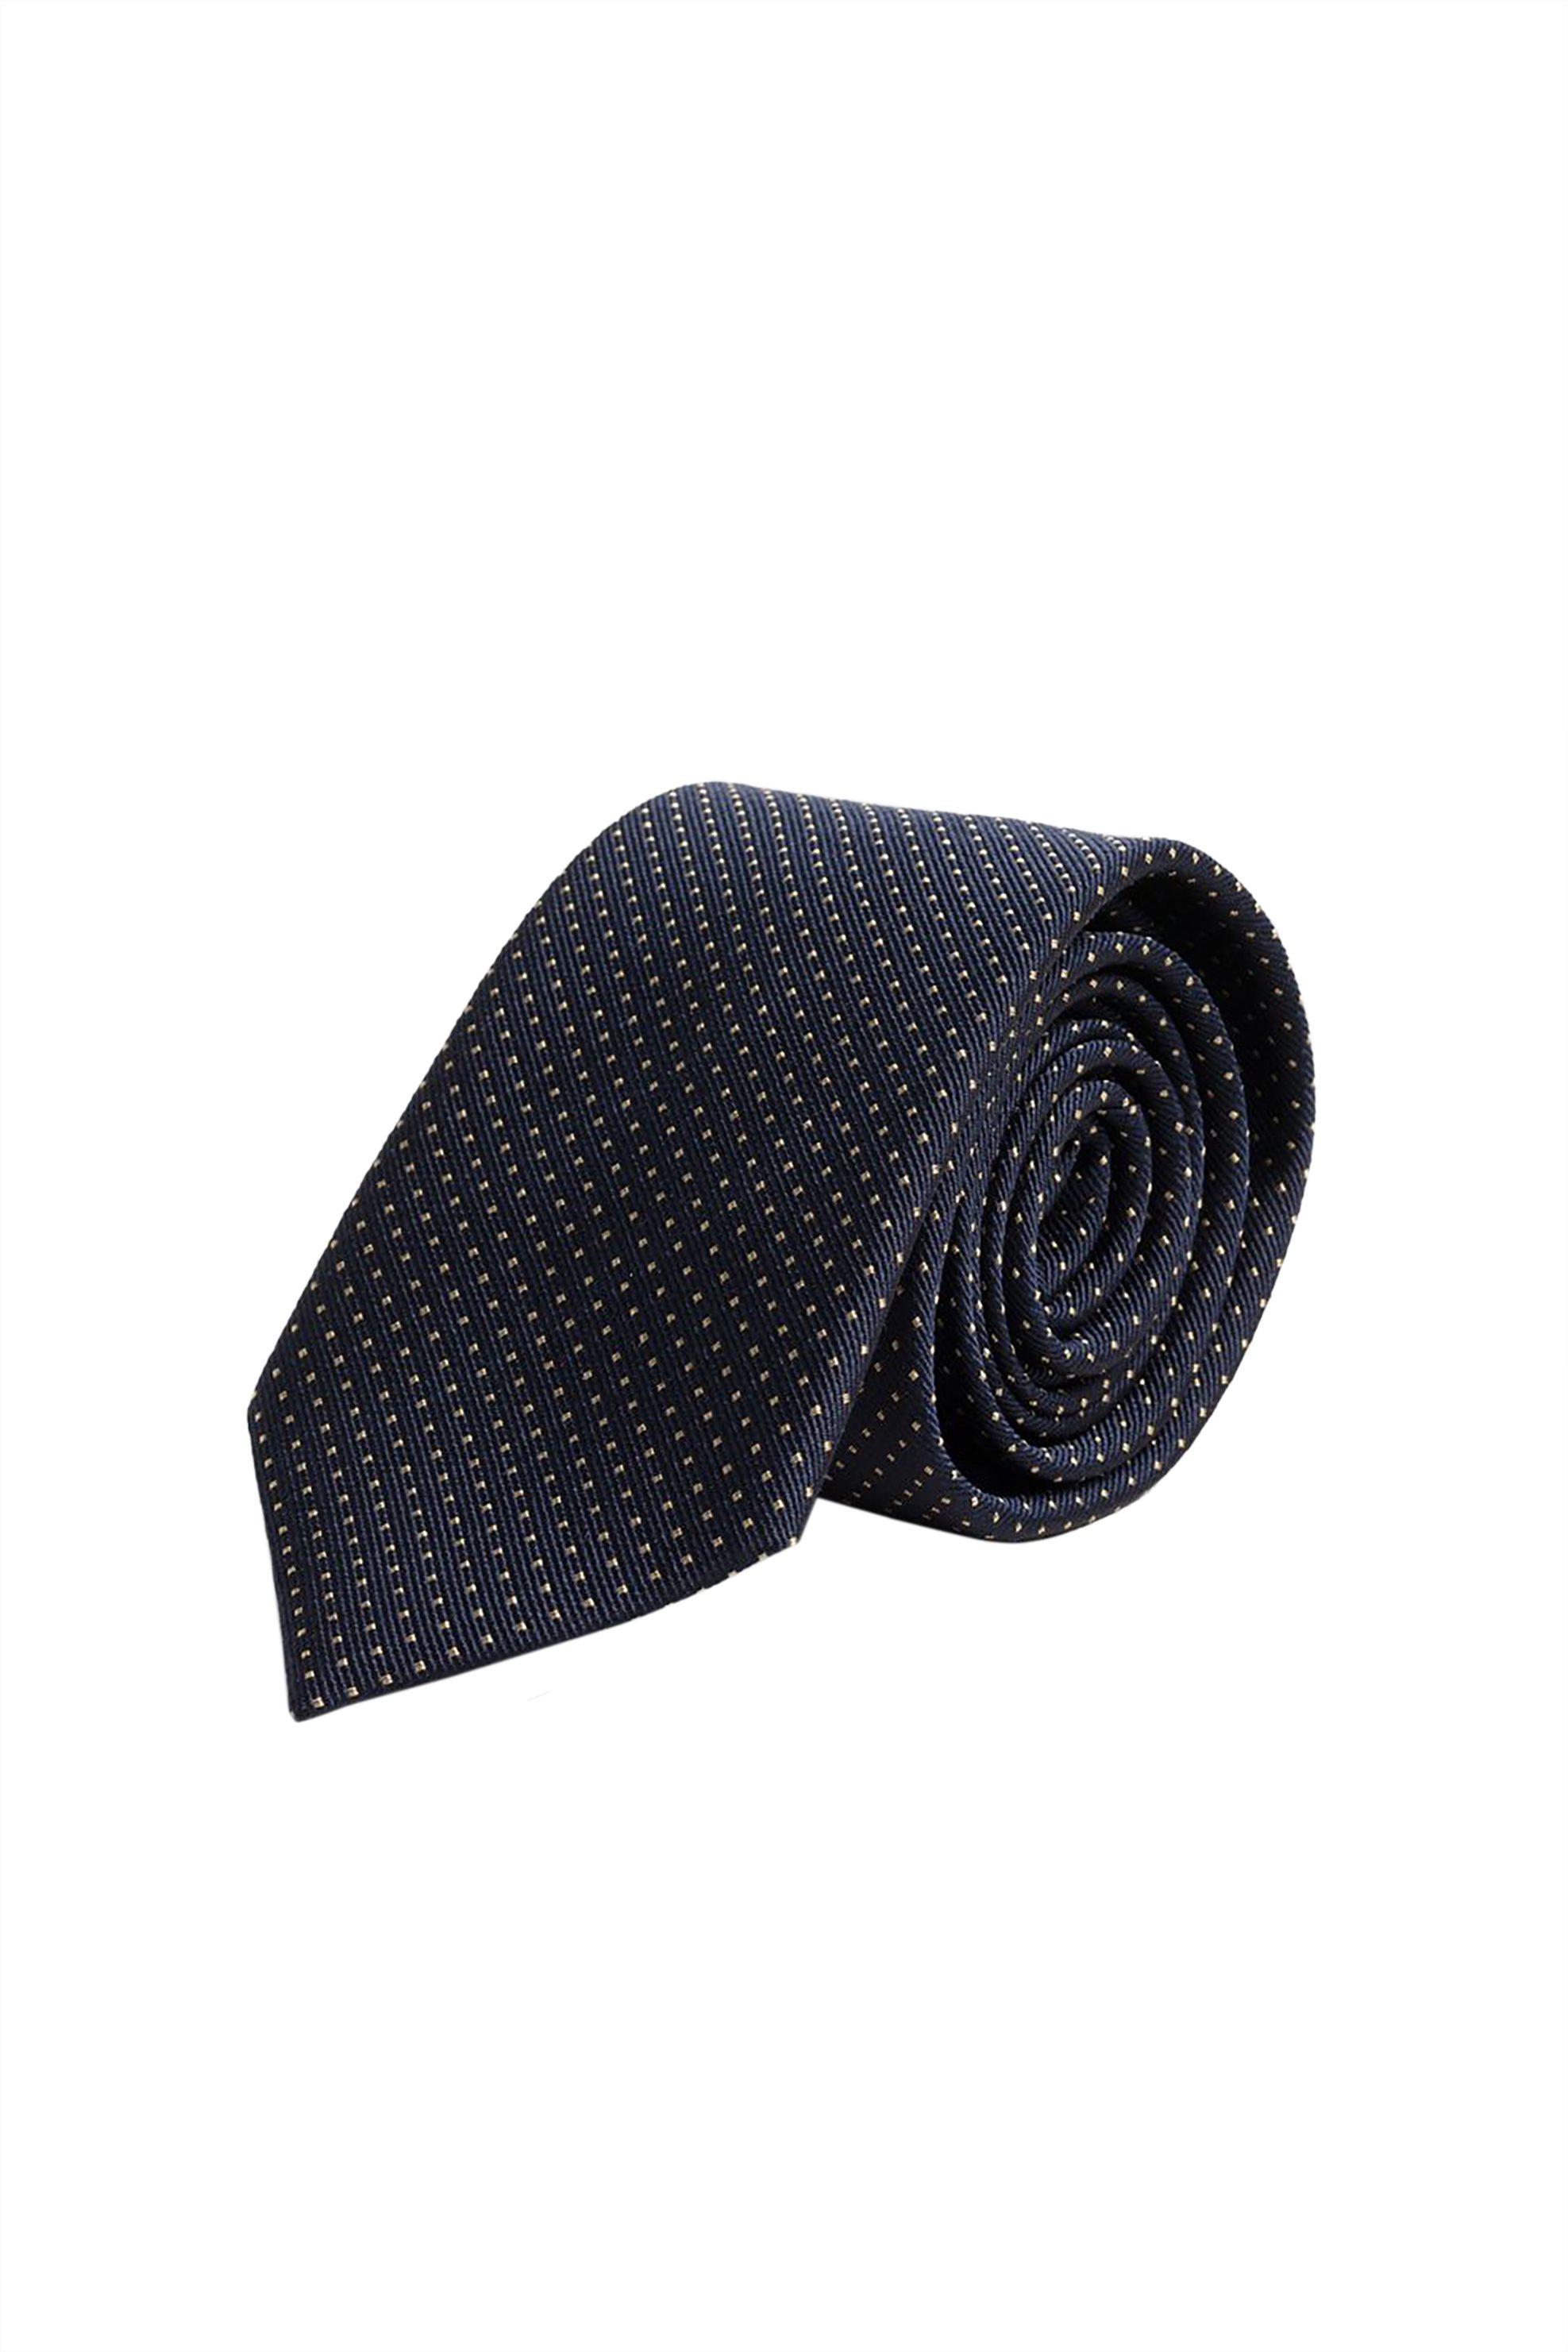 Gant ανδρική μεταξωτή γραβάτα με πουά print